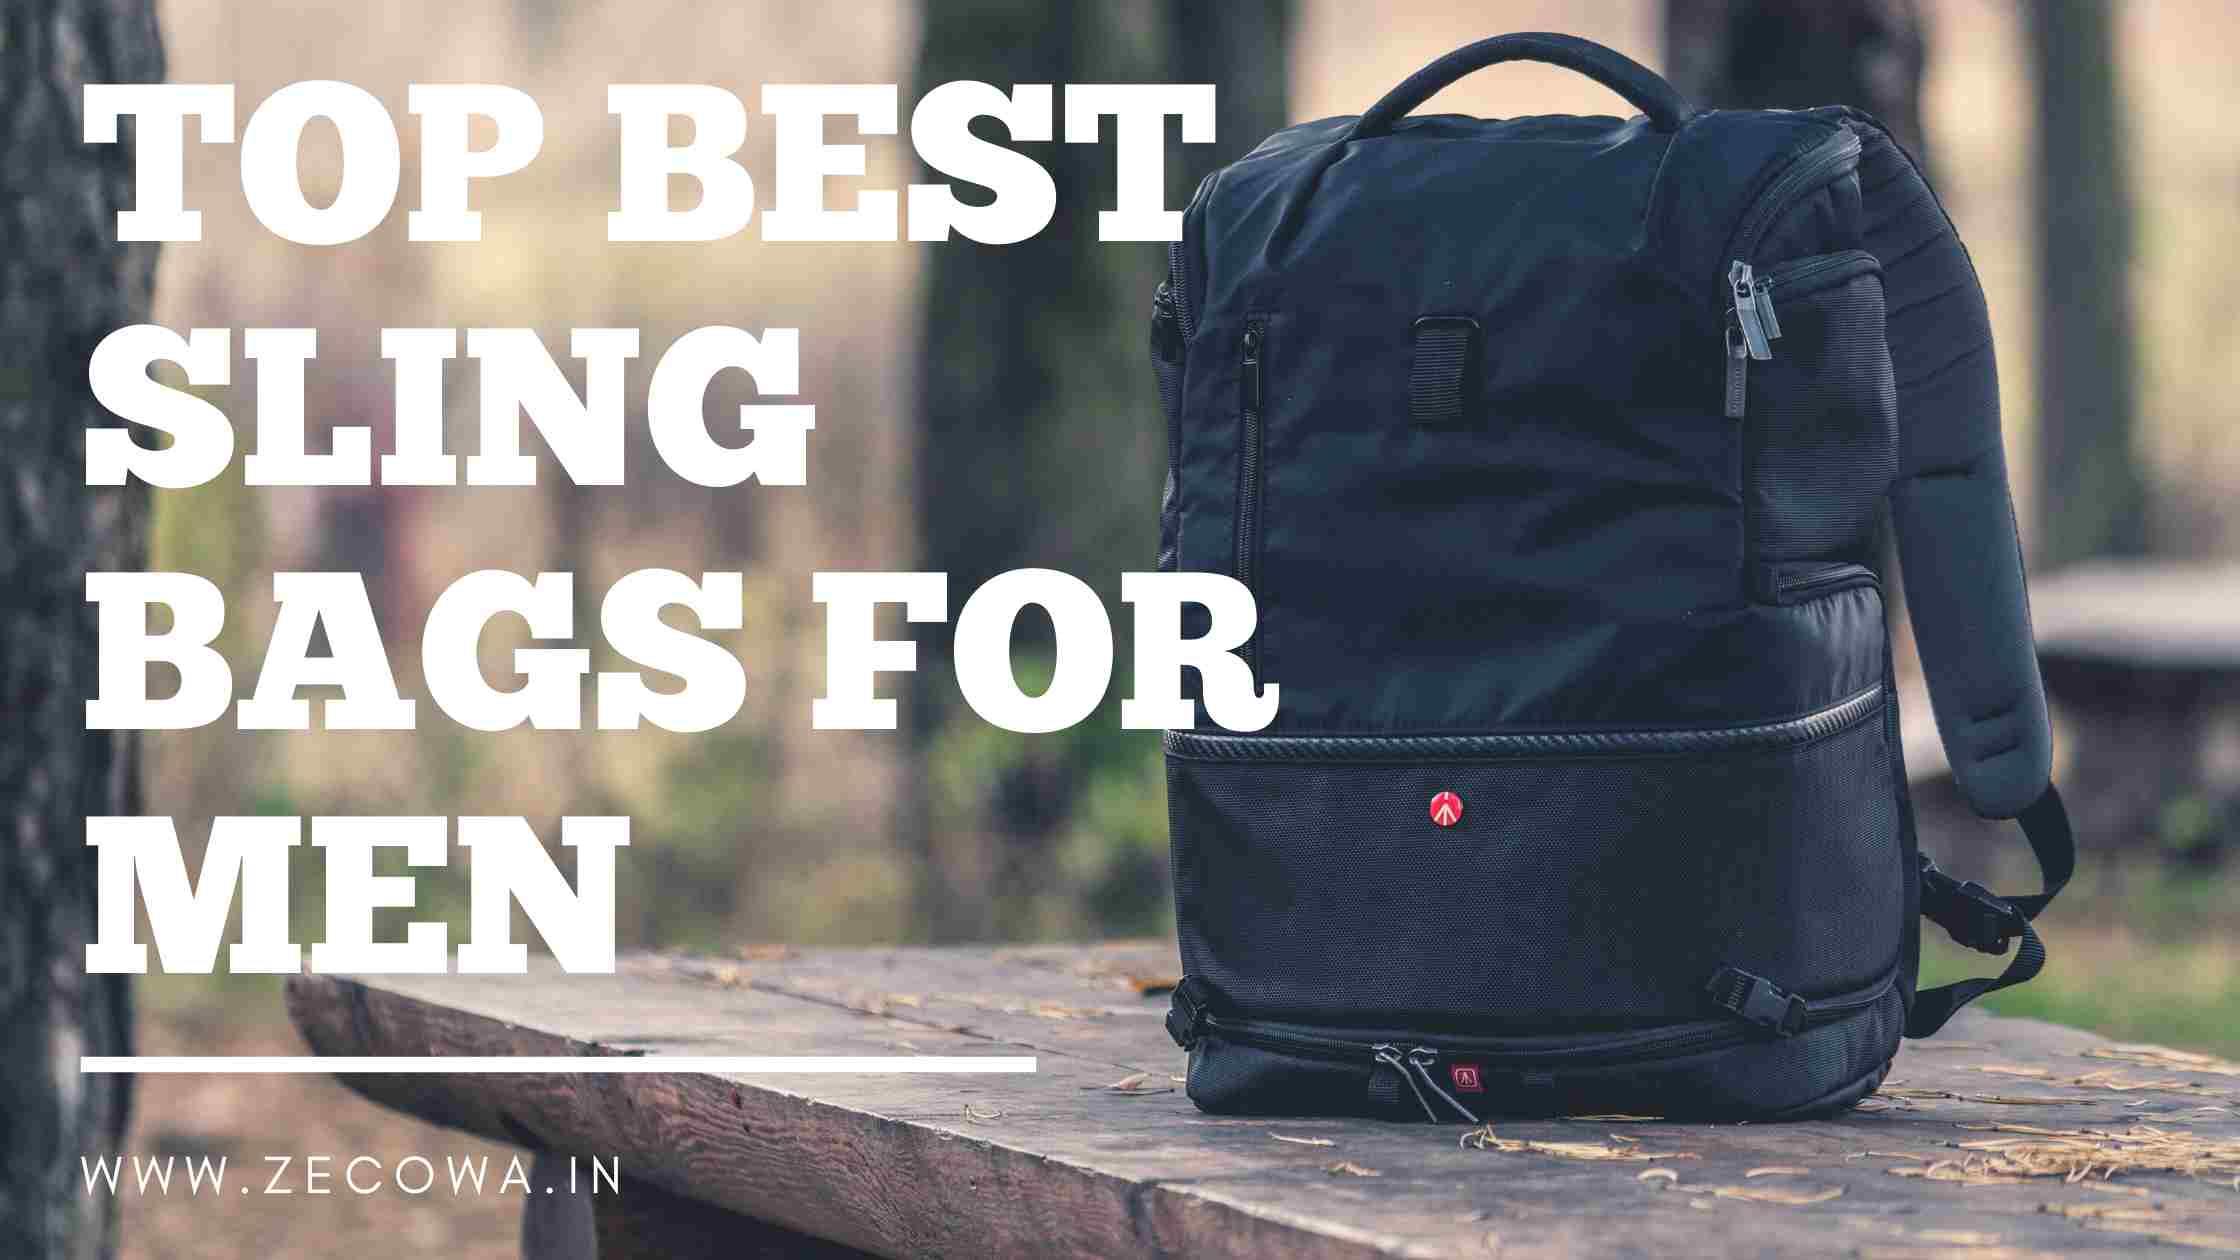 TOP BEST SLING BAGS FOR MEN